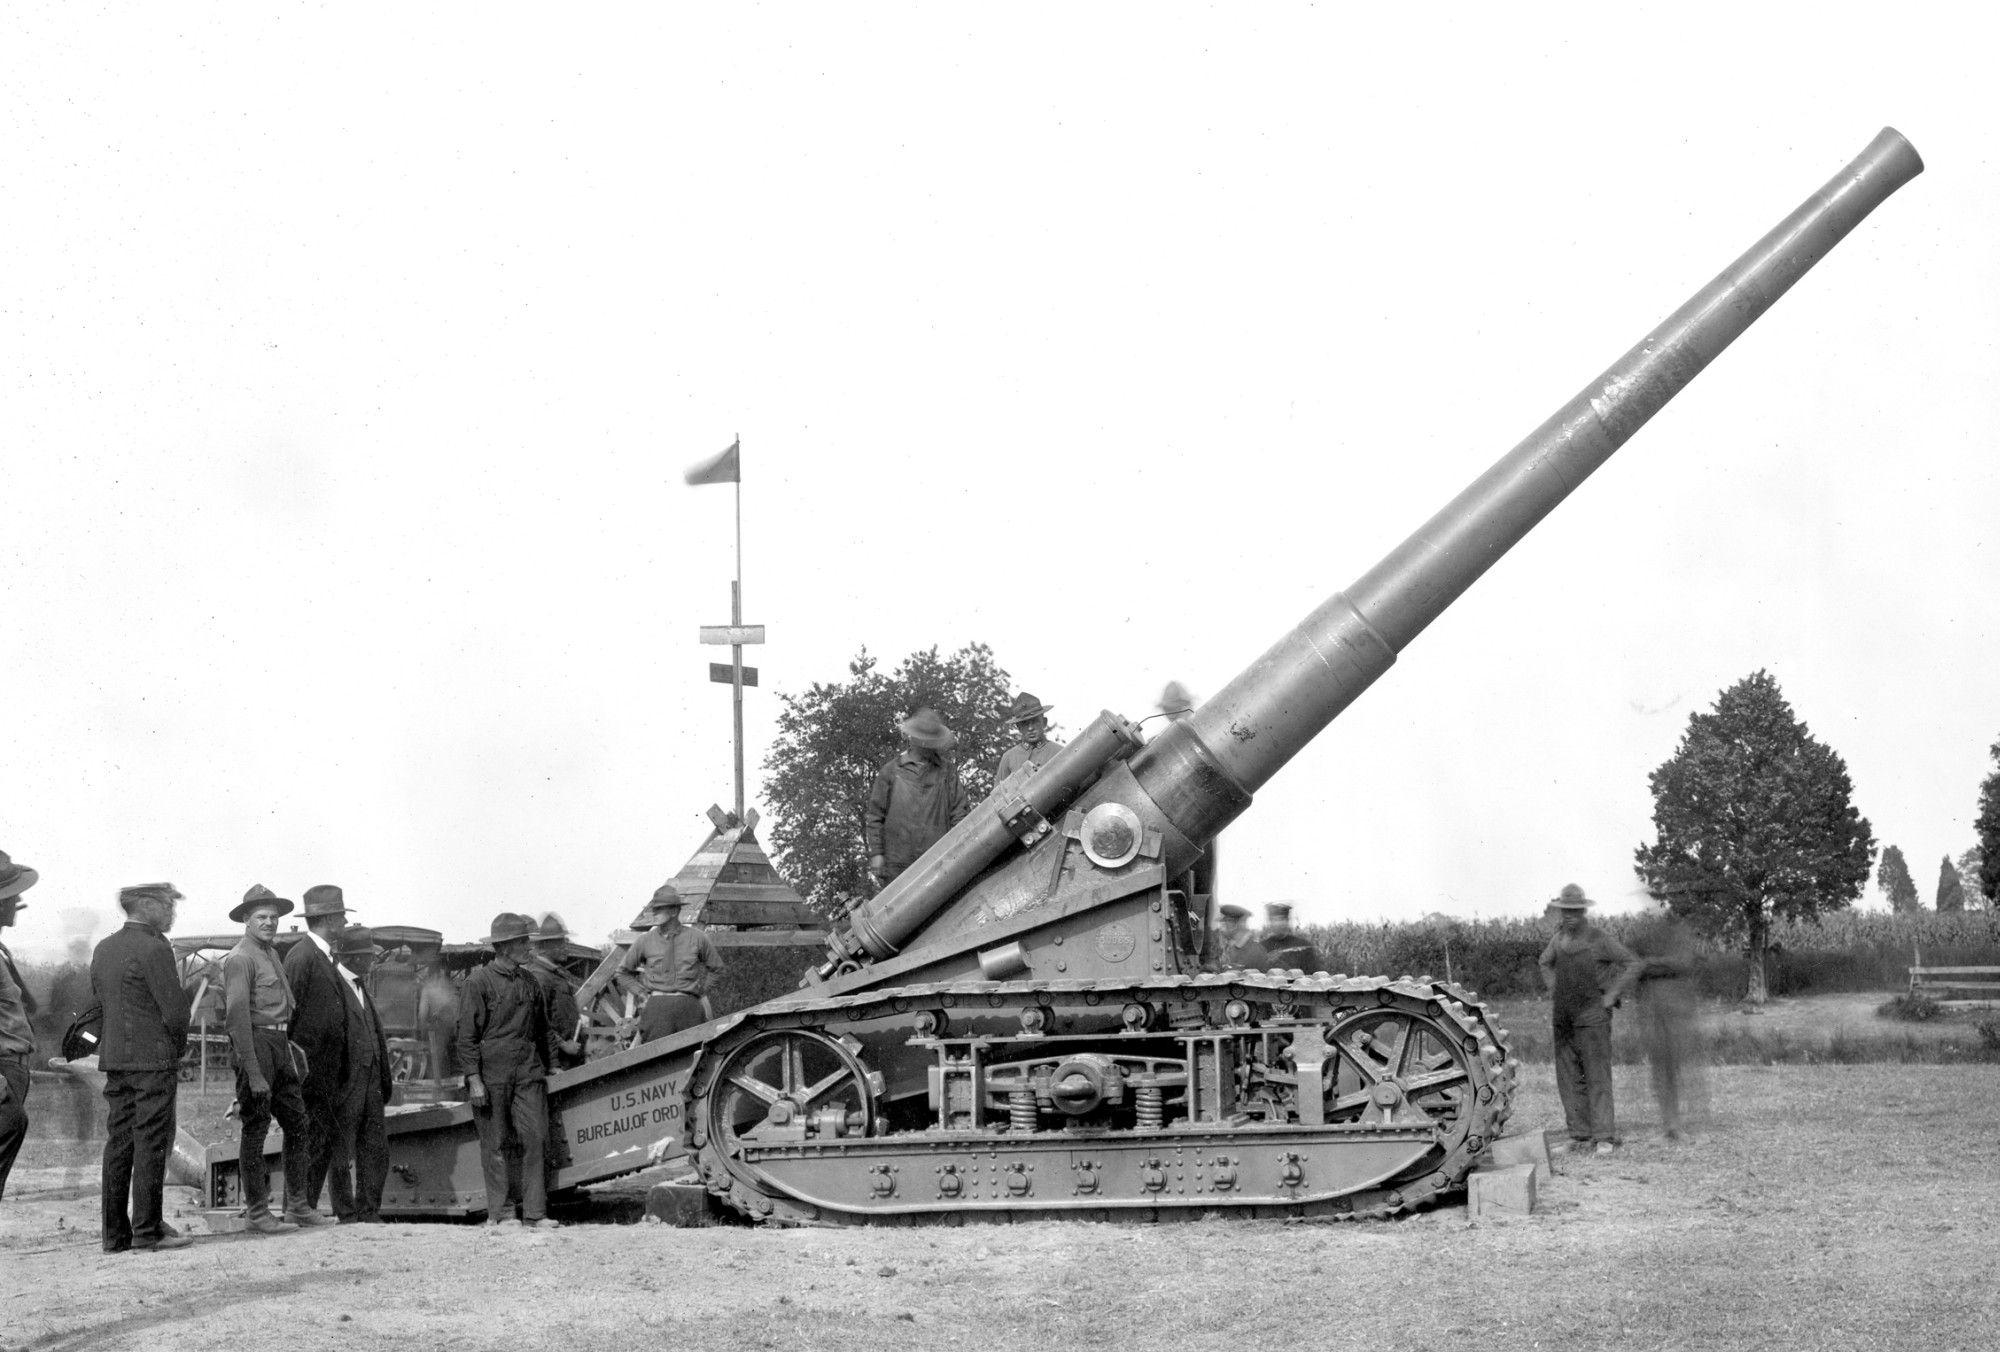 A 1918 file photo shows the first gun fired at Naval Weapons Station  Dahlgren. The World War I-era 7-inch 01789f59e58e6